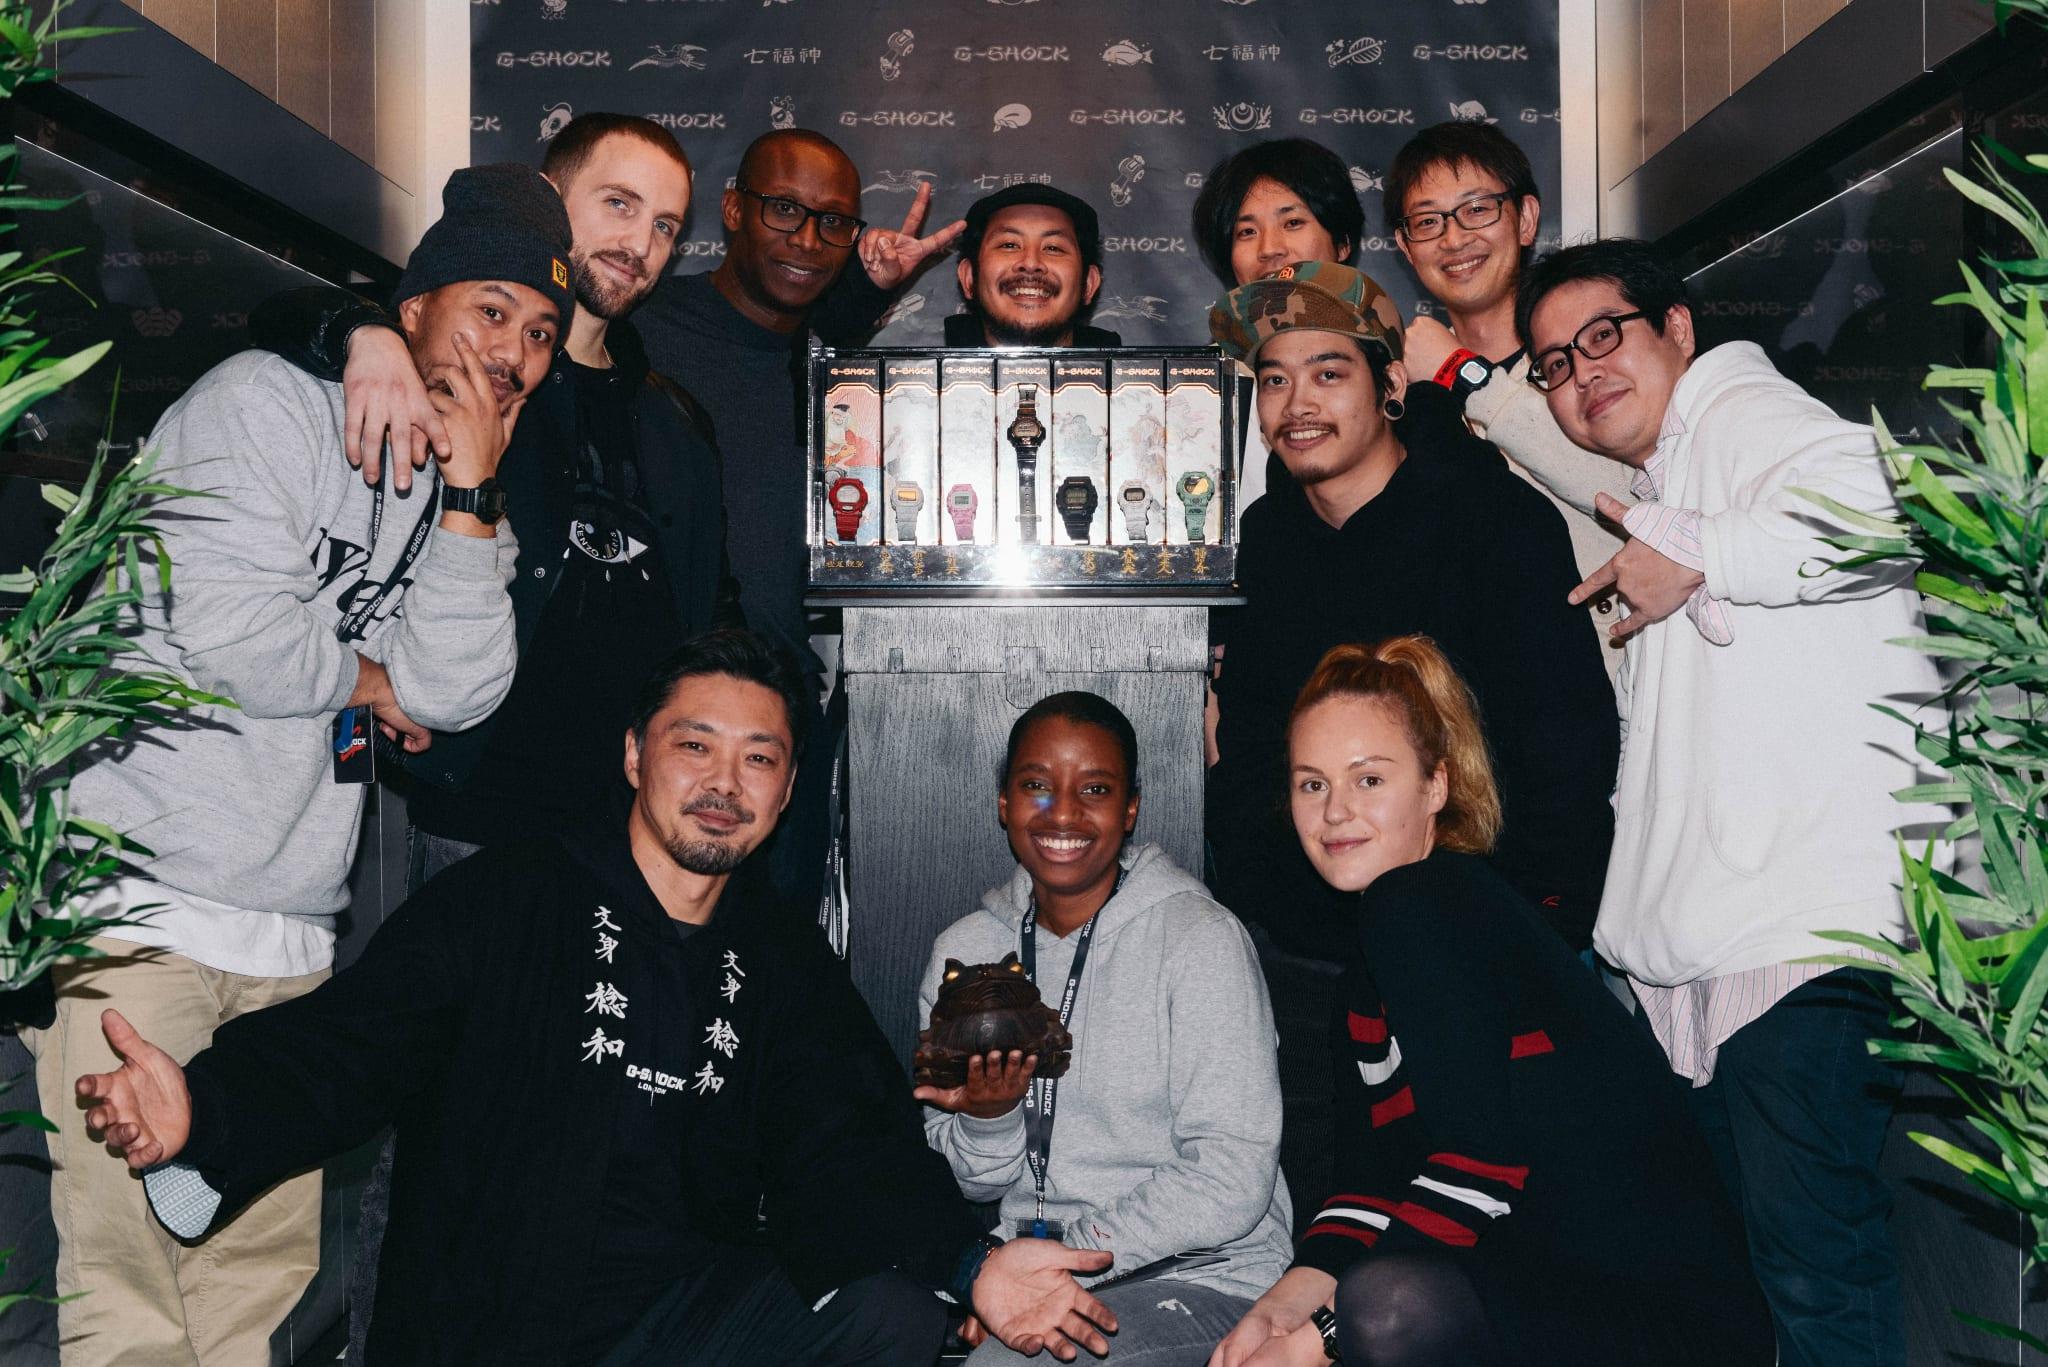 G-SHOCK-EVENT-JAN24-2019-53